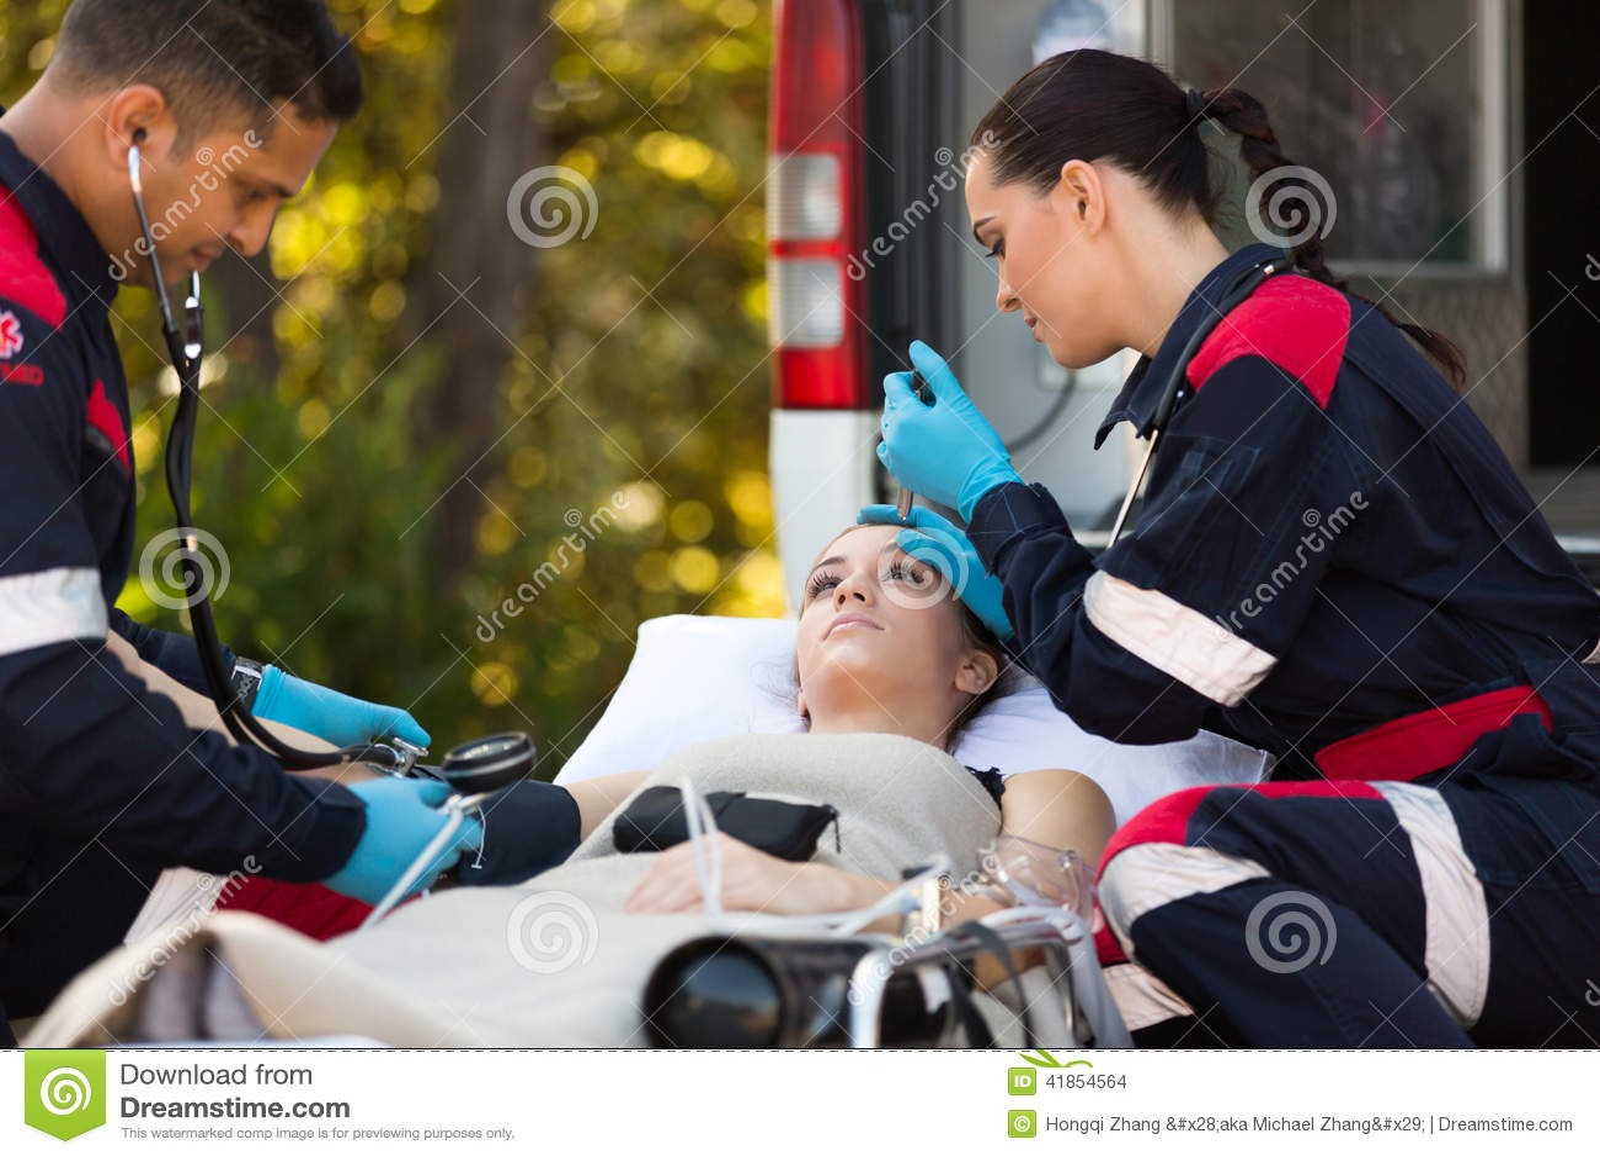 Emergency medical technicians patients